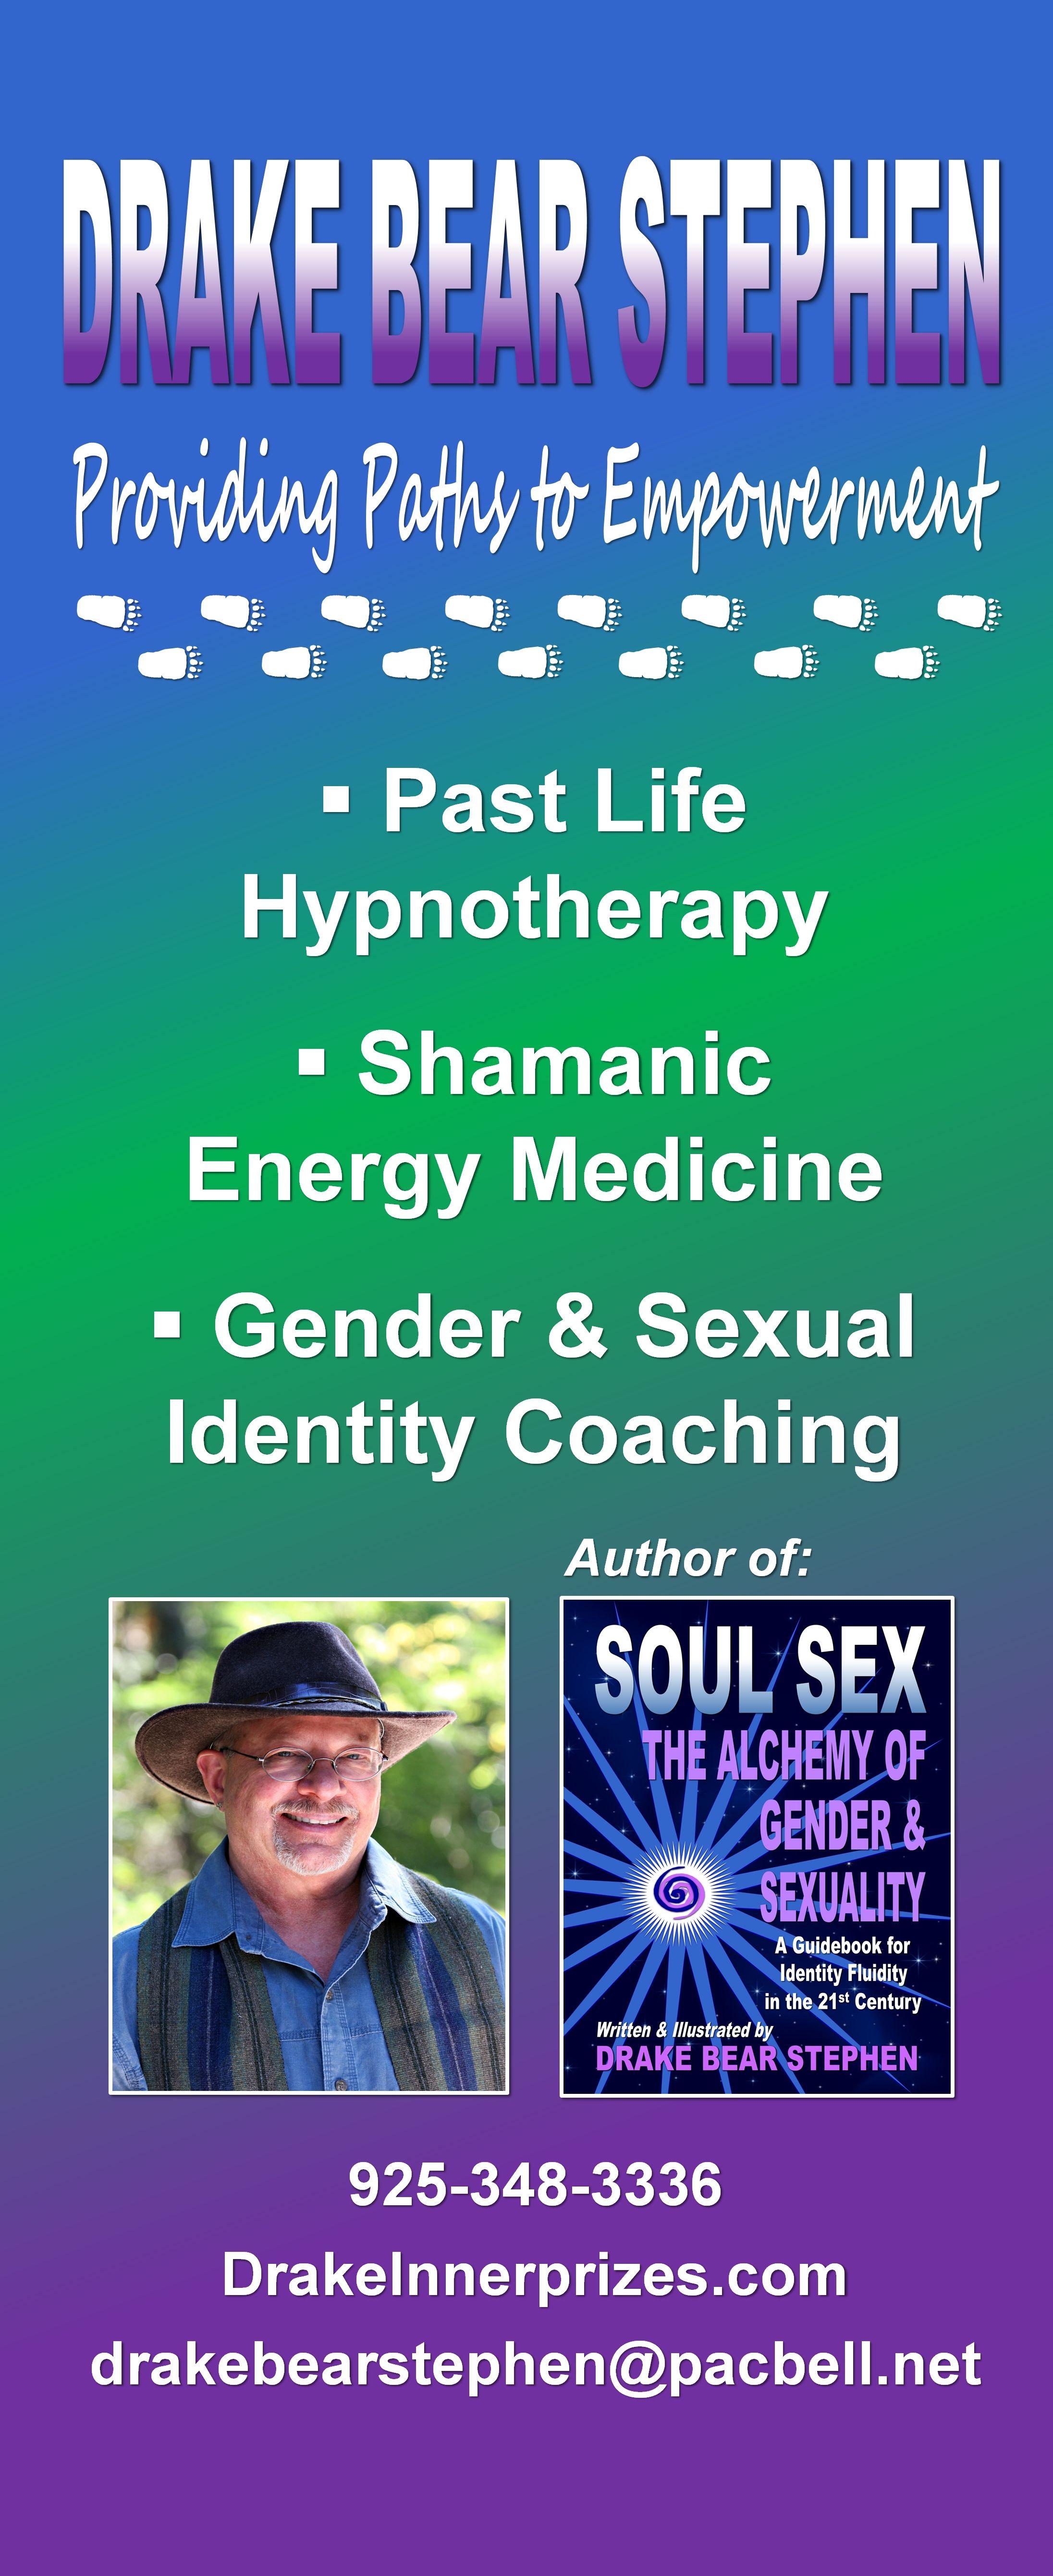 Drake Bear Stephen in 2020 | Energy medicine, Past life ...